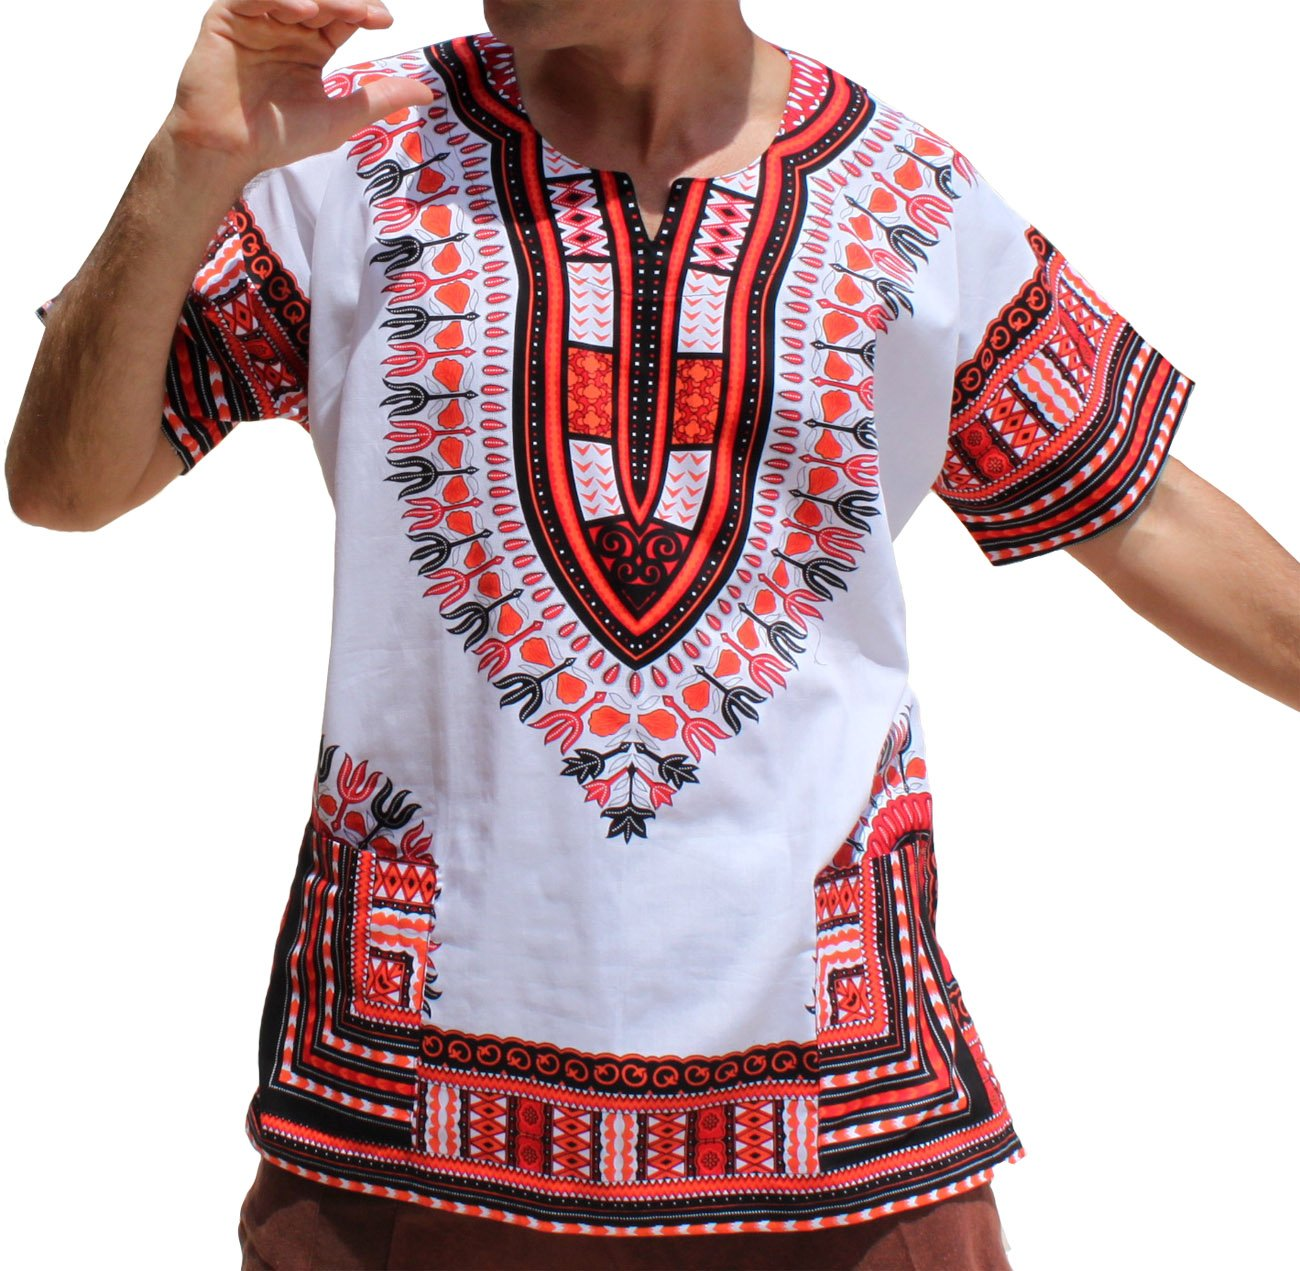 RaanPahMuang Brand Unisex Bright African White Dashiki Cotton Shirt #8 Light Red Medium